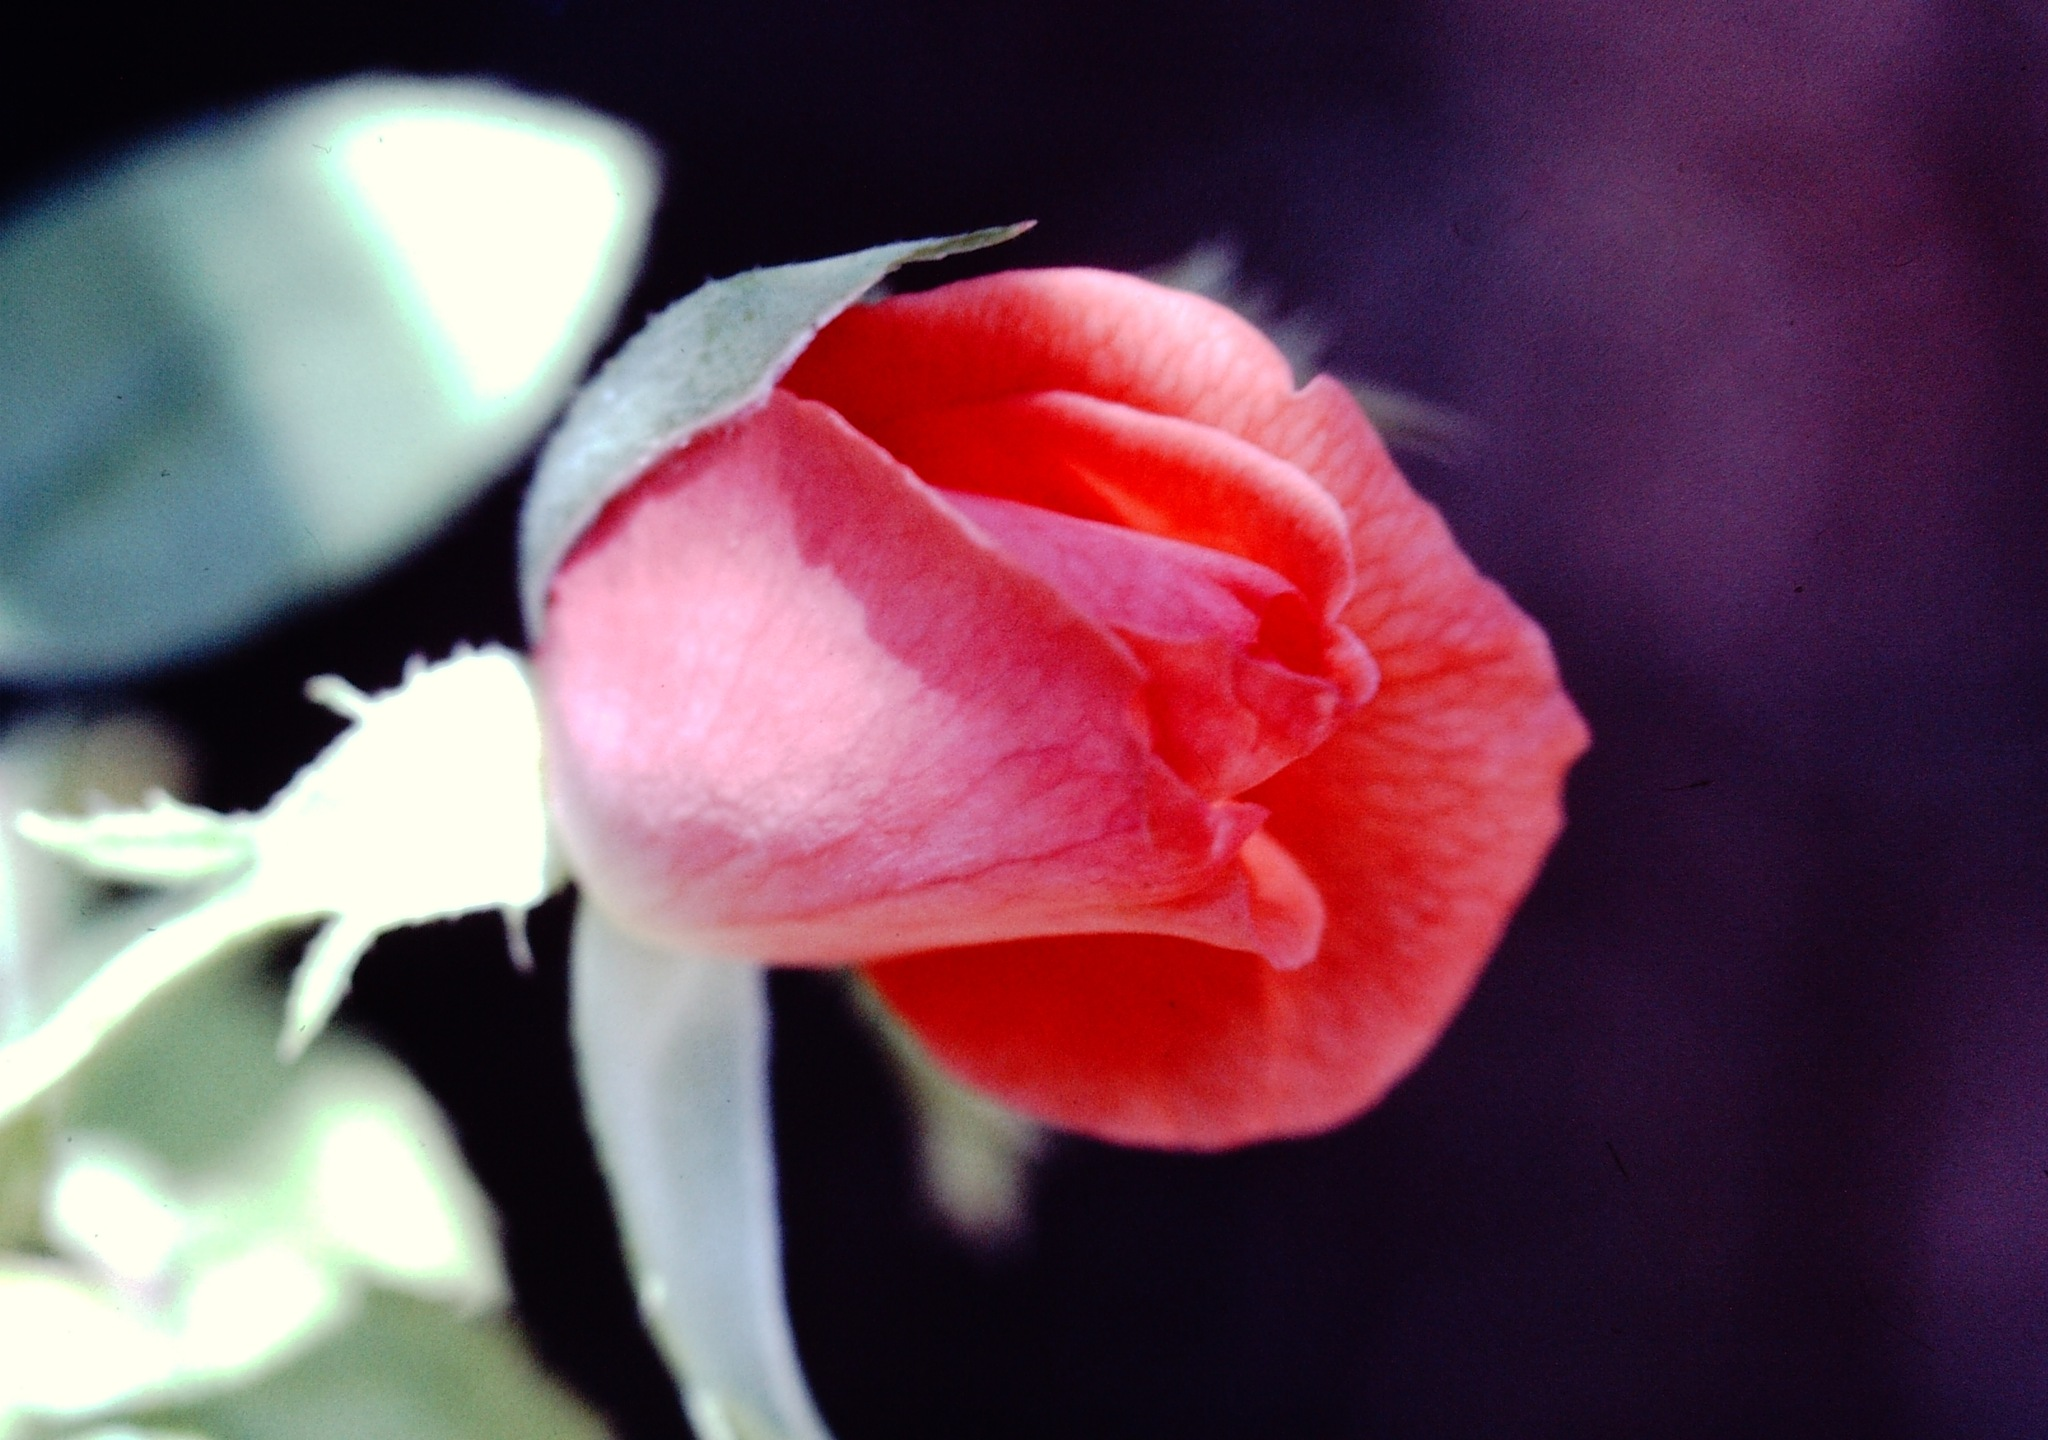 GOOD MORNING YOUPIC, FULL SCREEN by Akin Saner